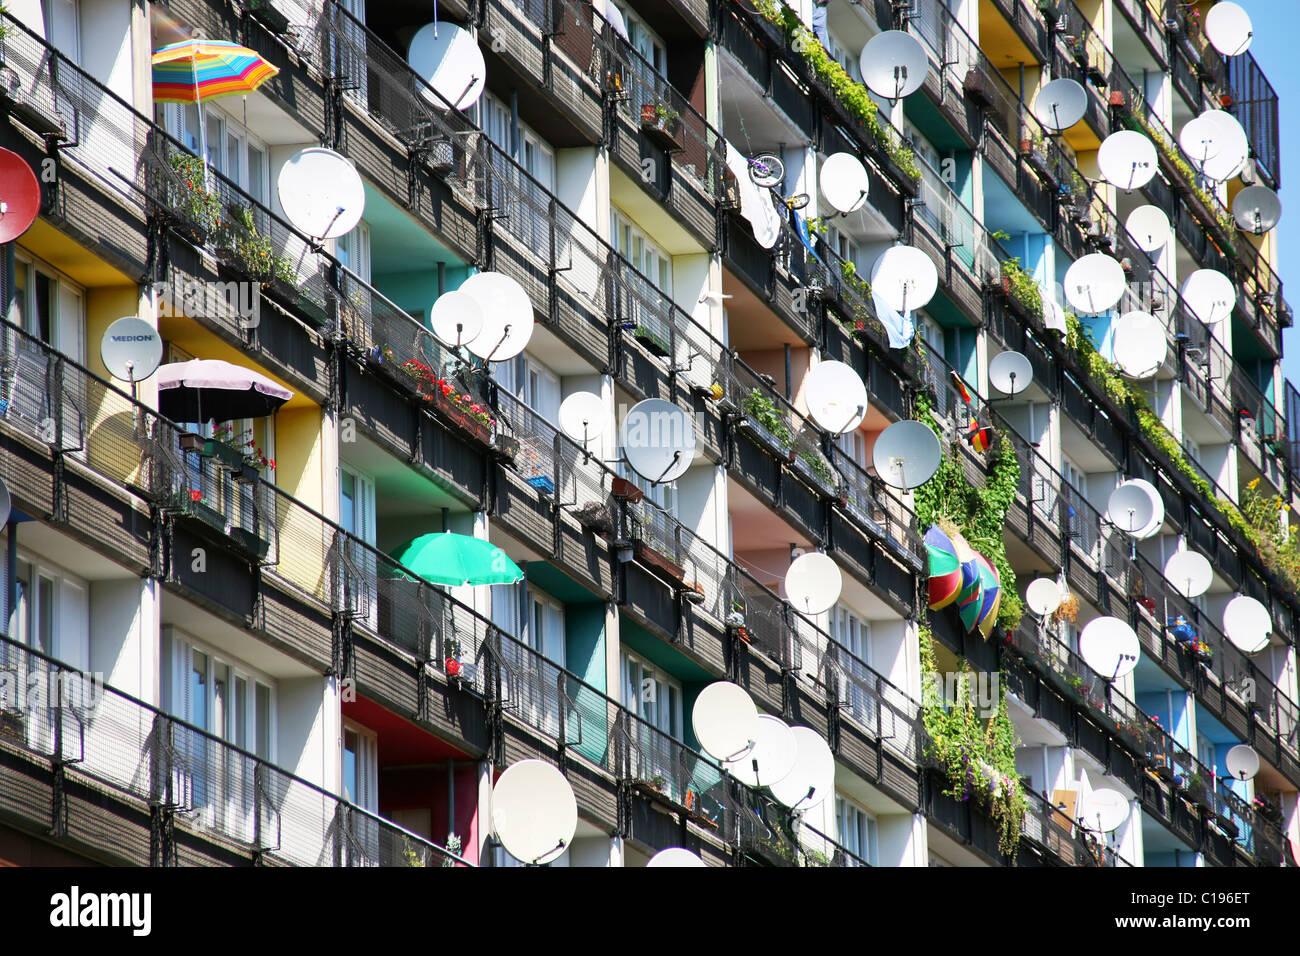 Apartment block, in Pallasstrasse, Berlin, Germany, Europe Stock Photo